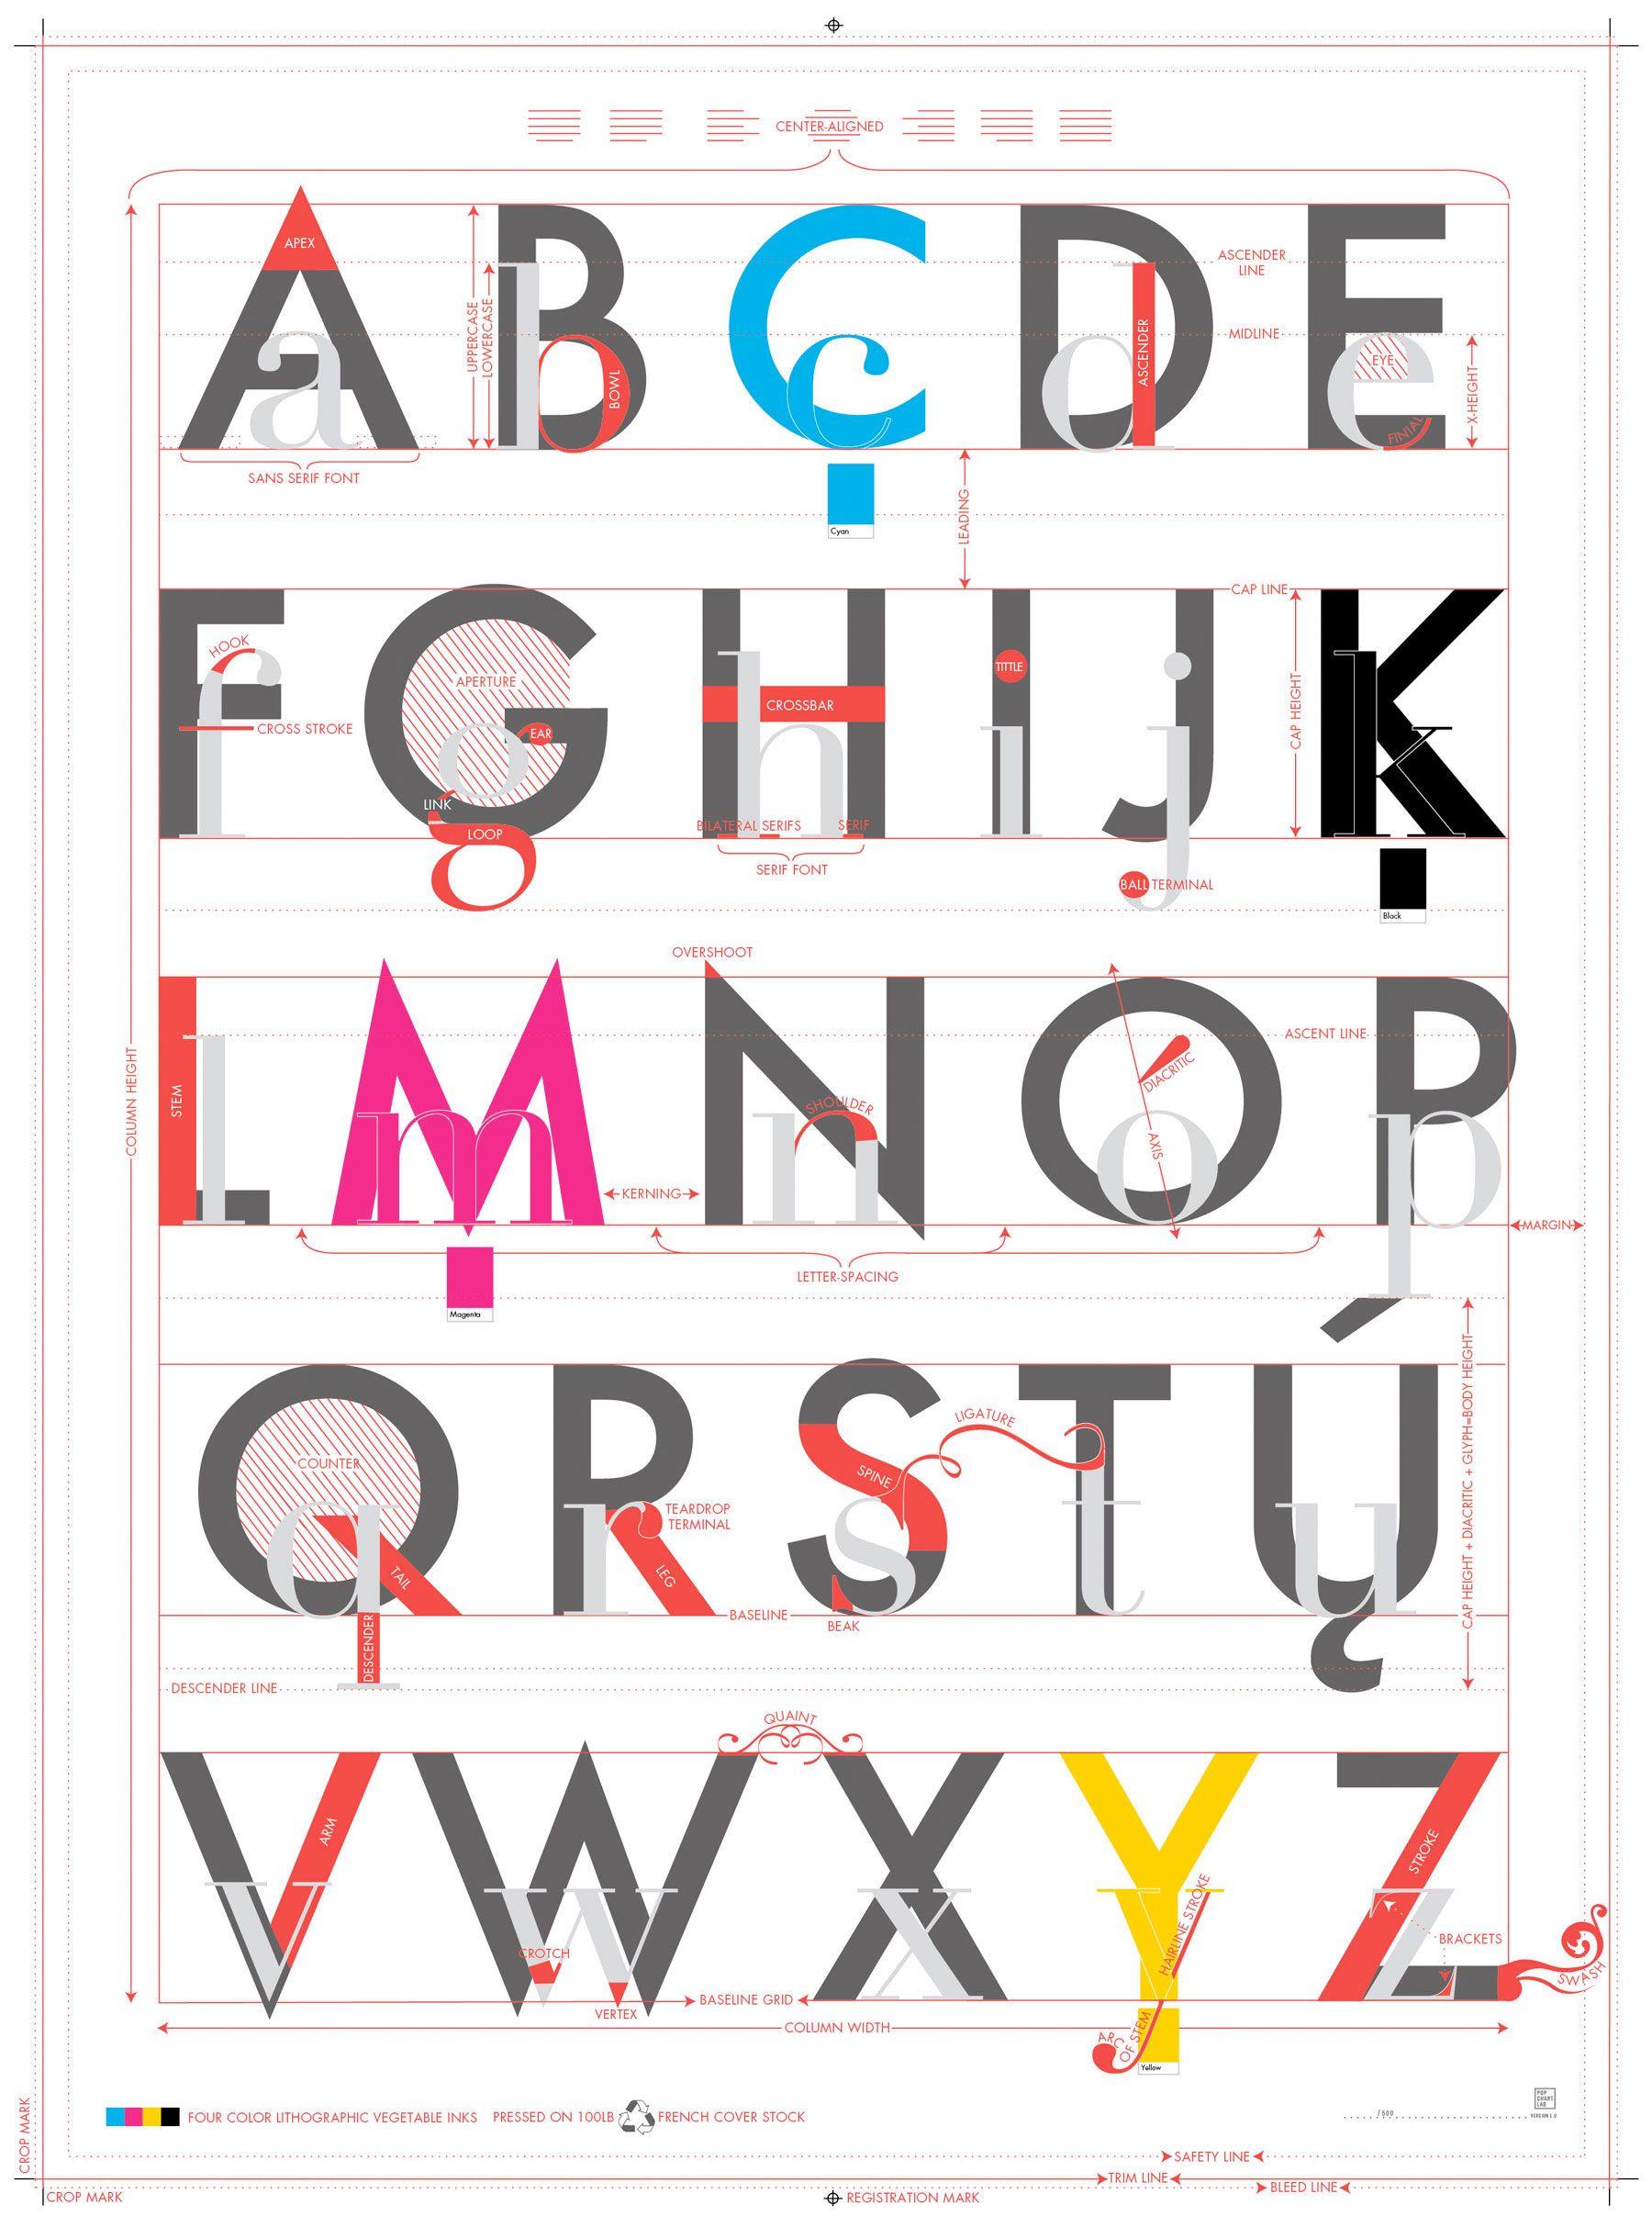 Pin De Luis Sanchez Maraia En Tipografia Pinterest Infografia